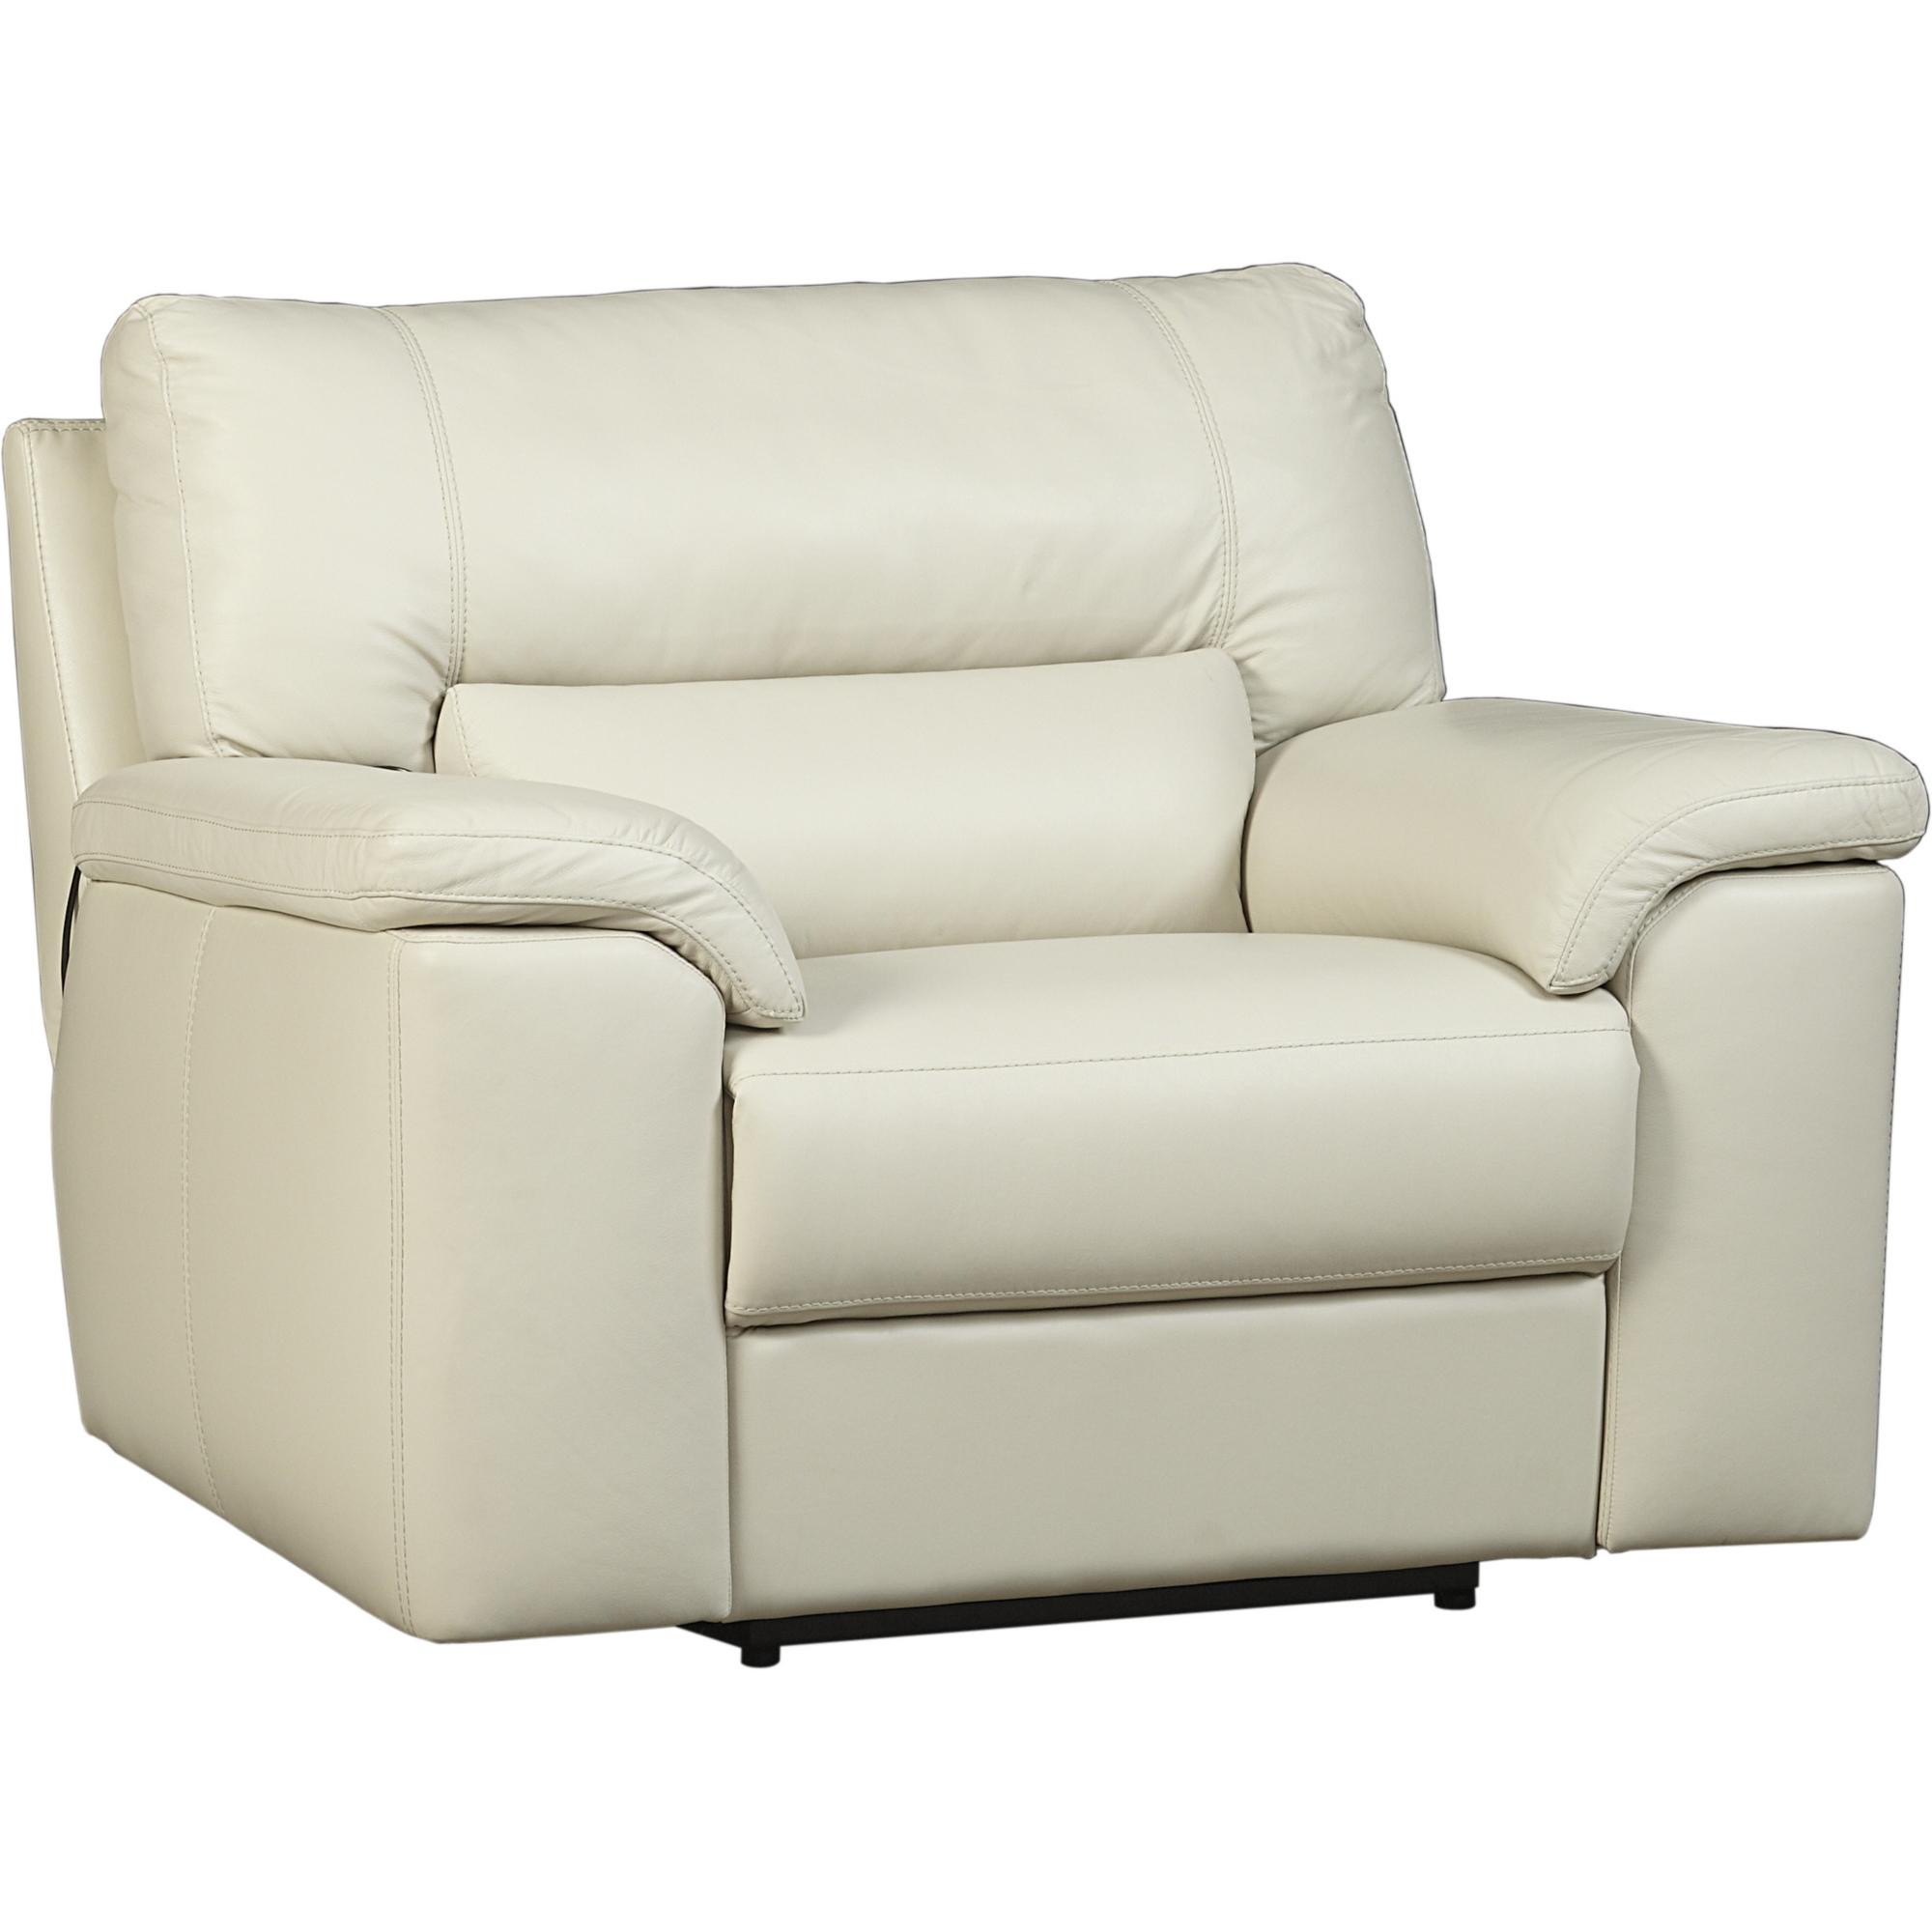 havertys siesta sofa. Black Bedroom Furniture Sets. Home Design Ideas